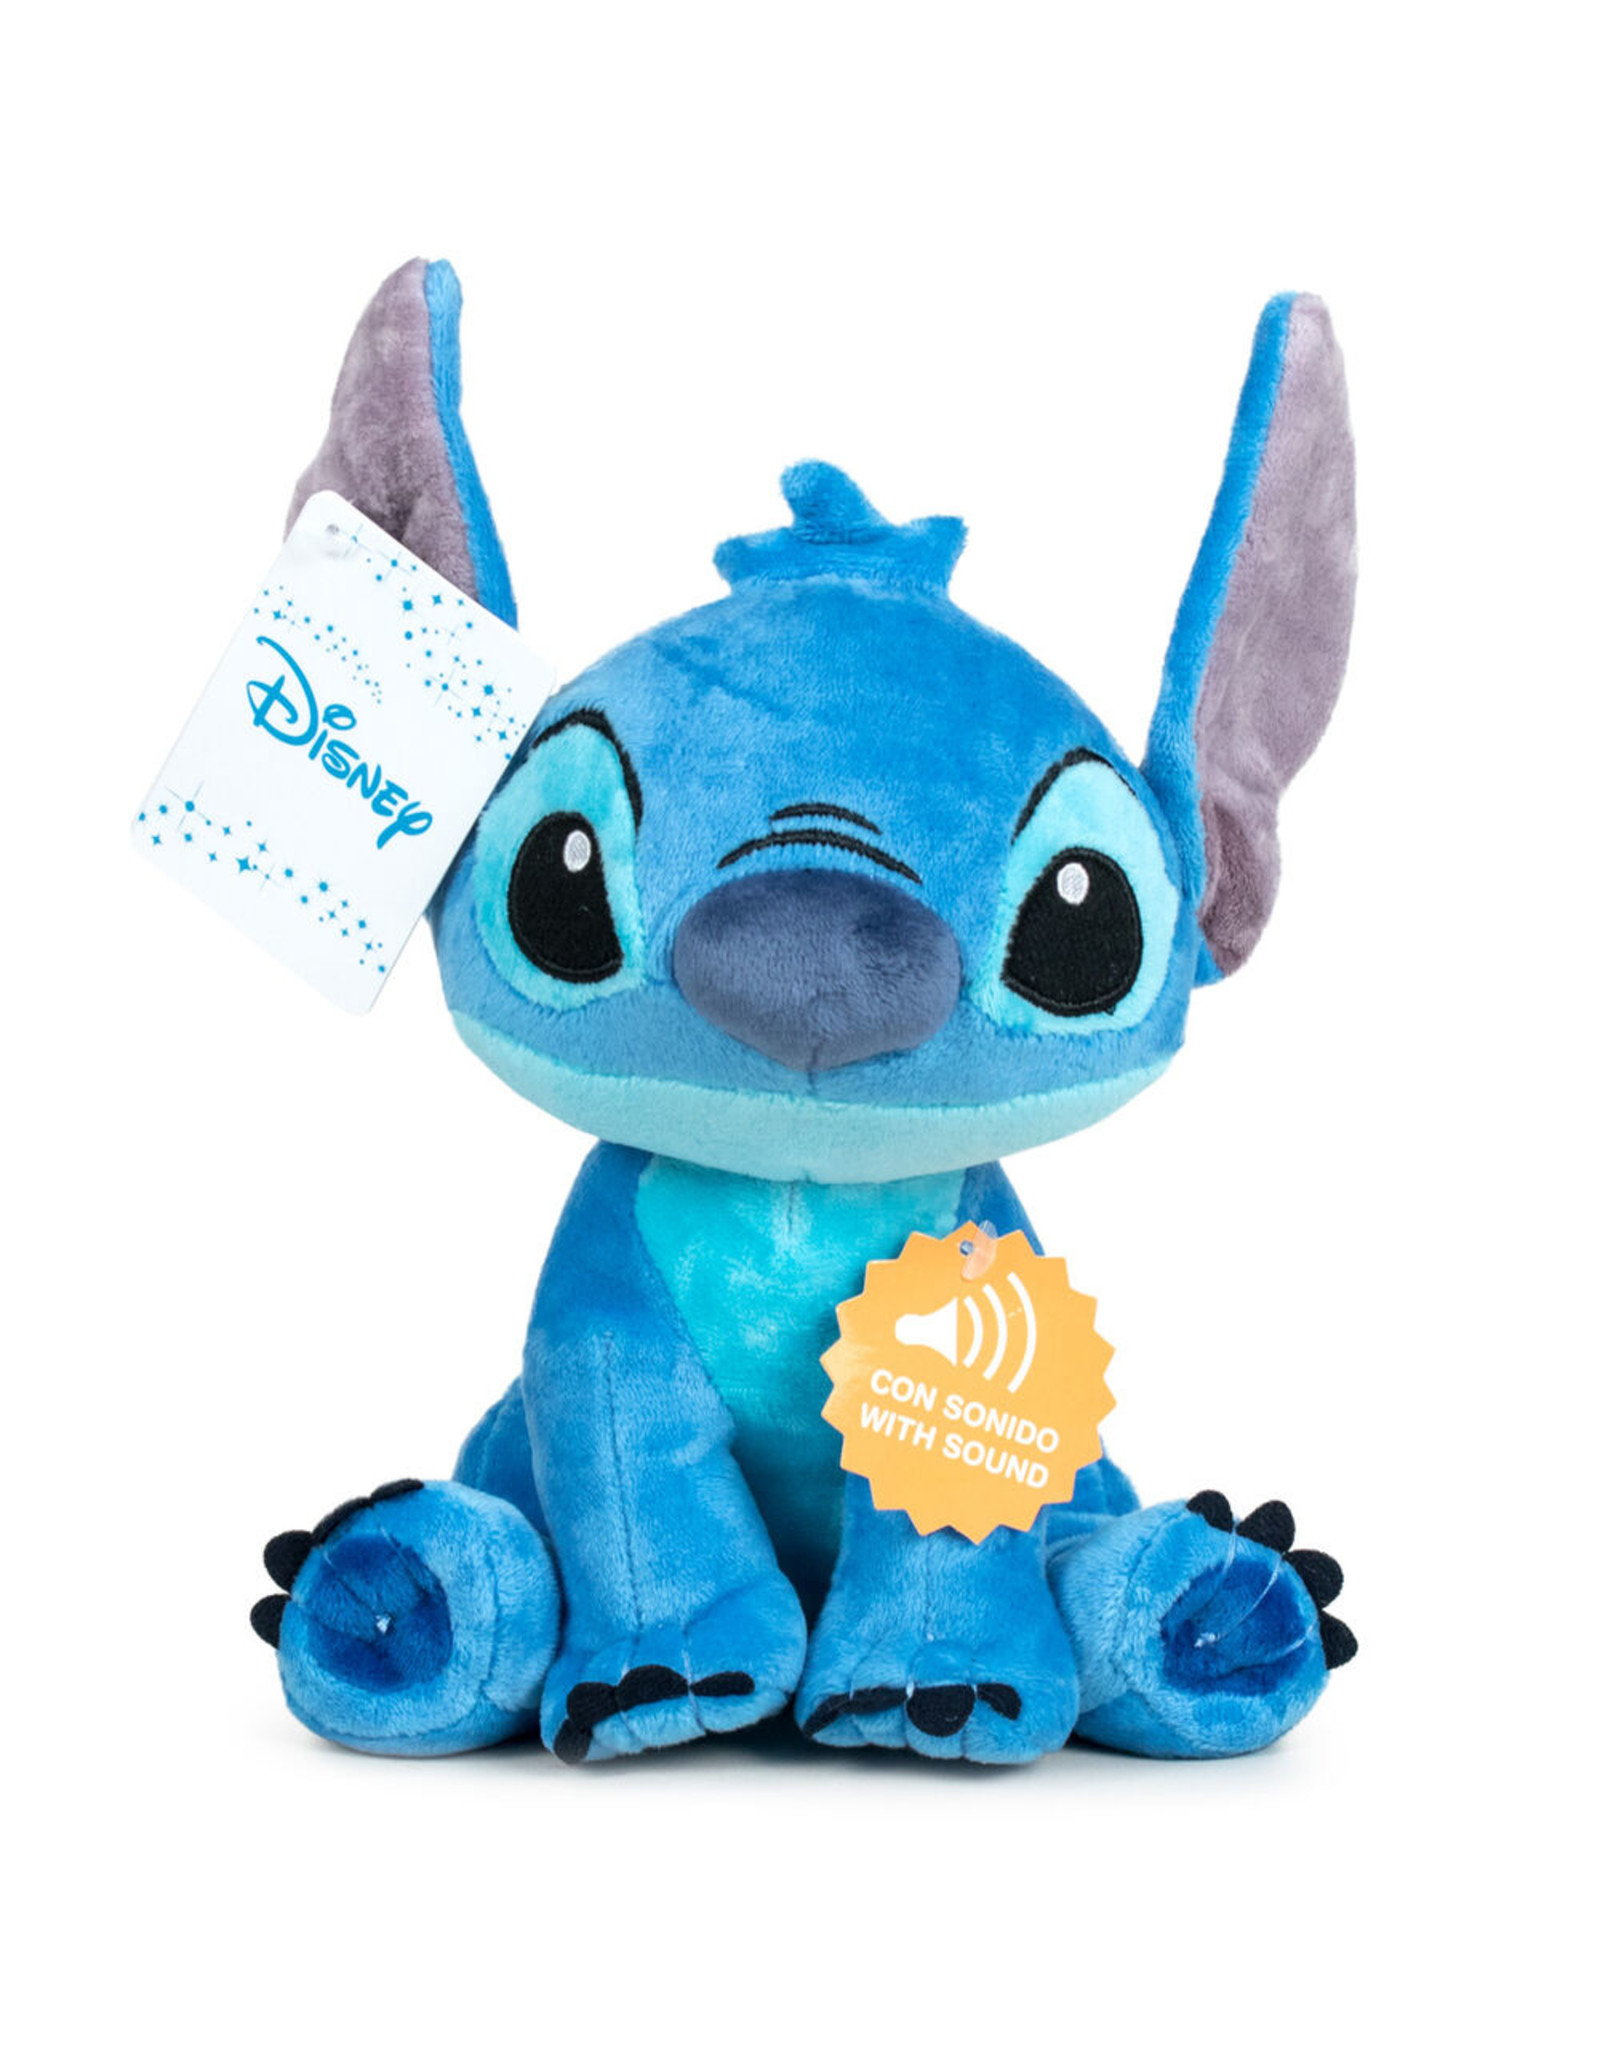 DISNEY Disney Stitch knuffelbeer with sound 30cm